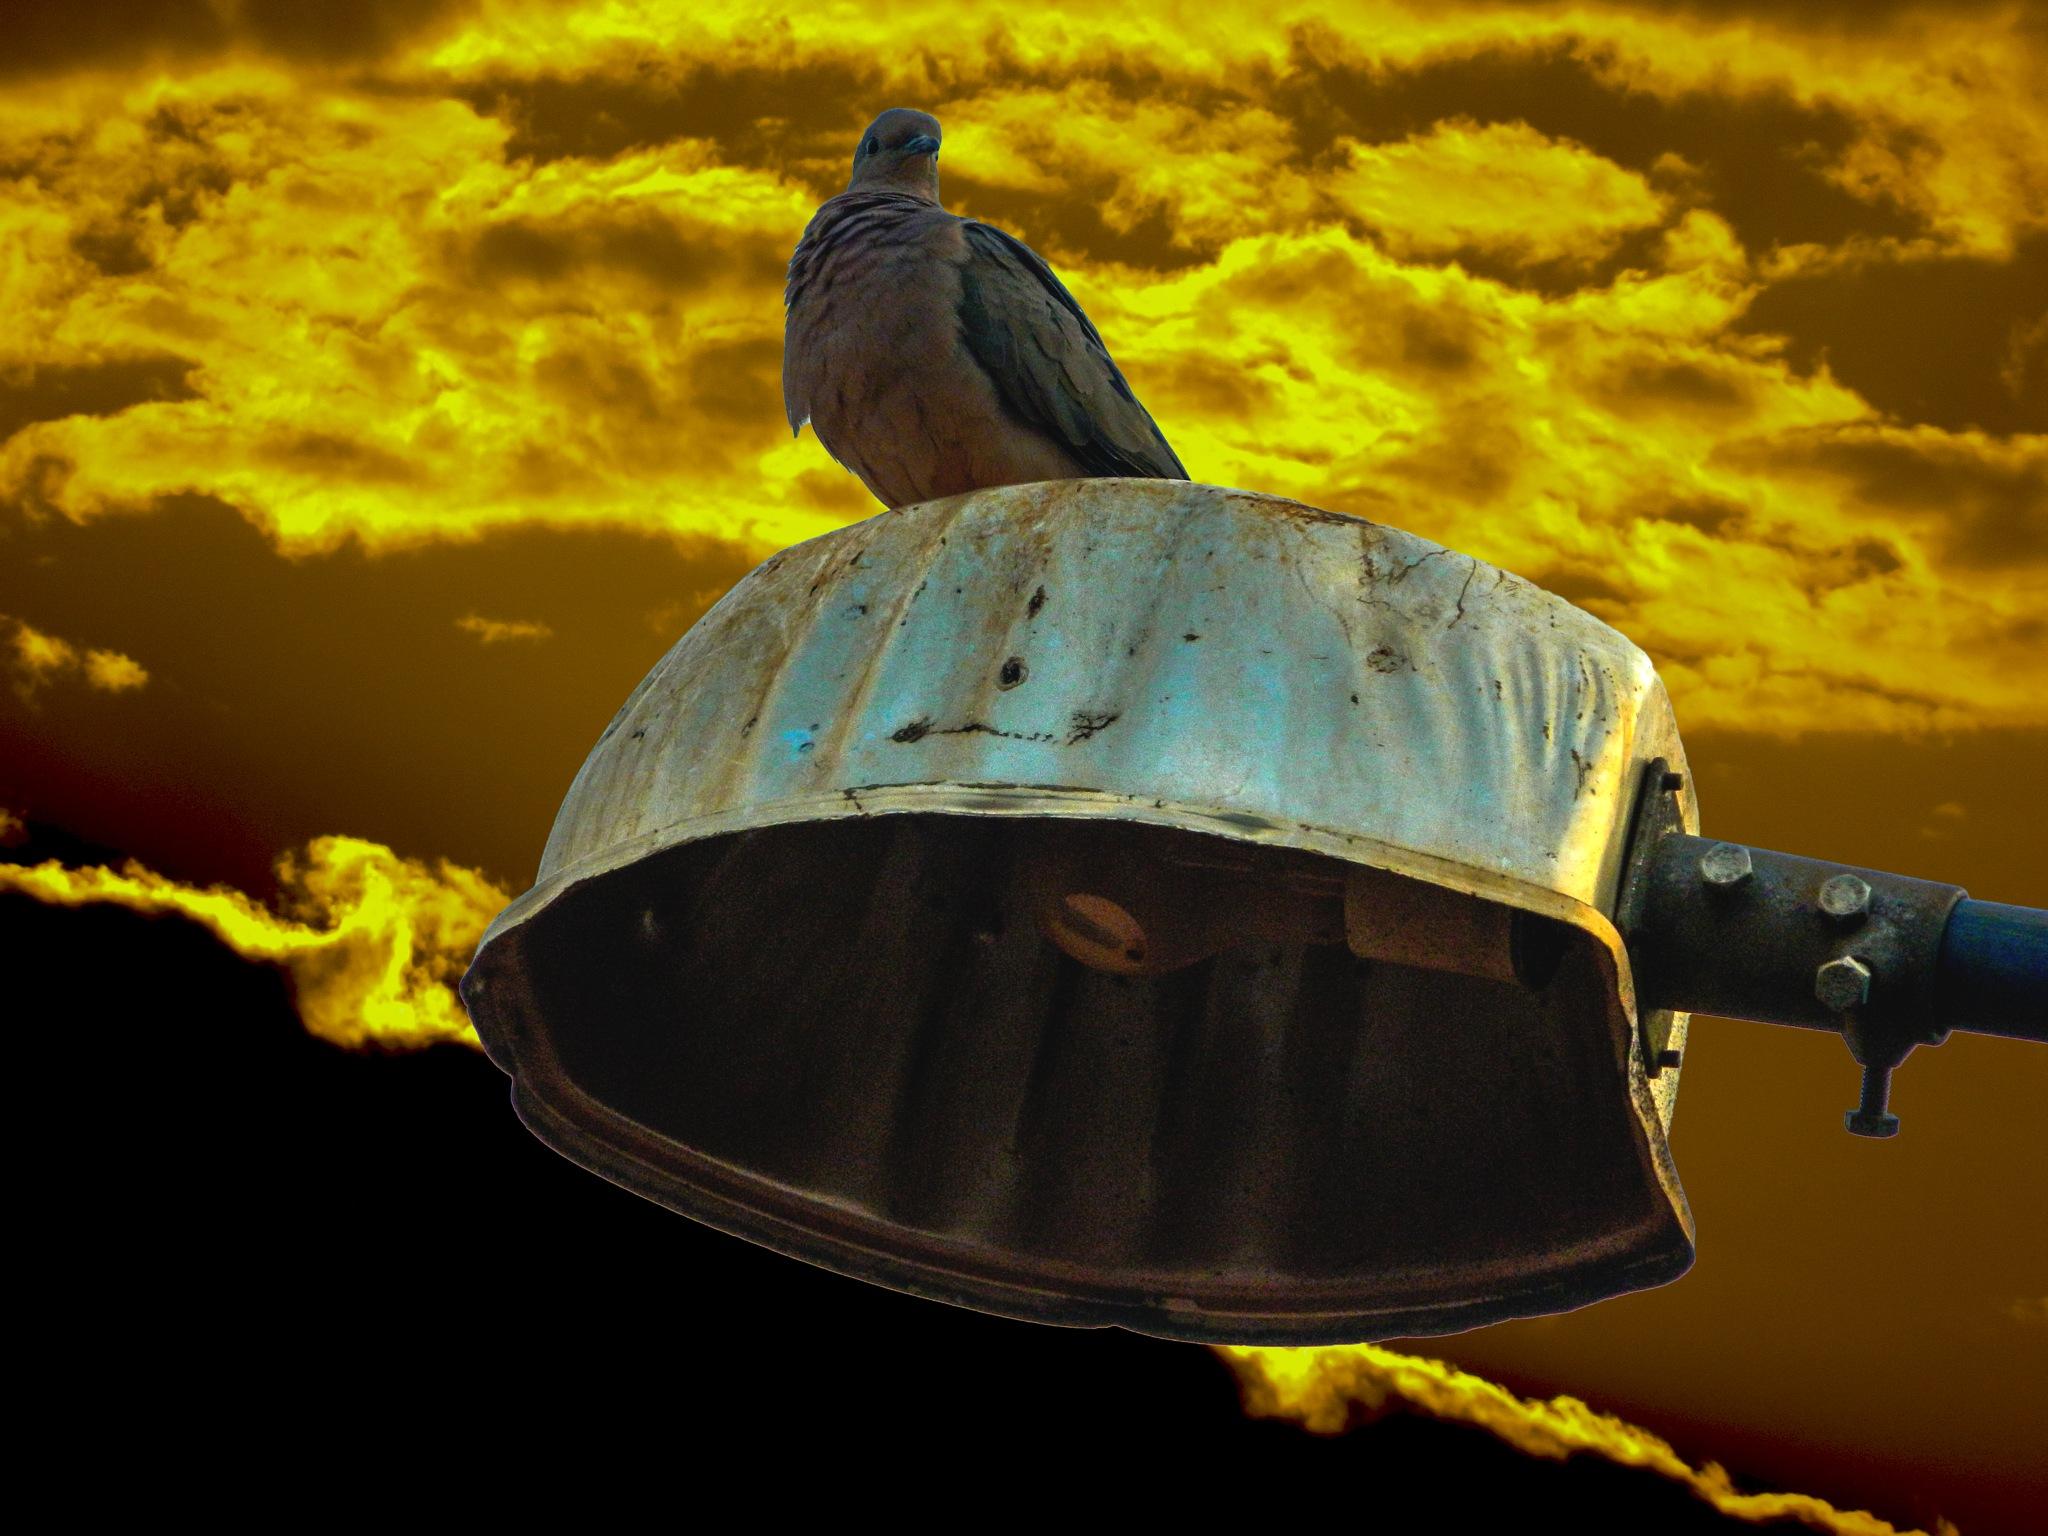 Sunset, pigeon and light by Marcos Verardino